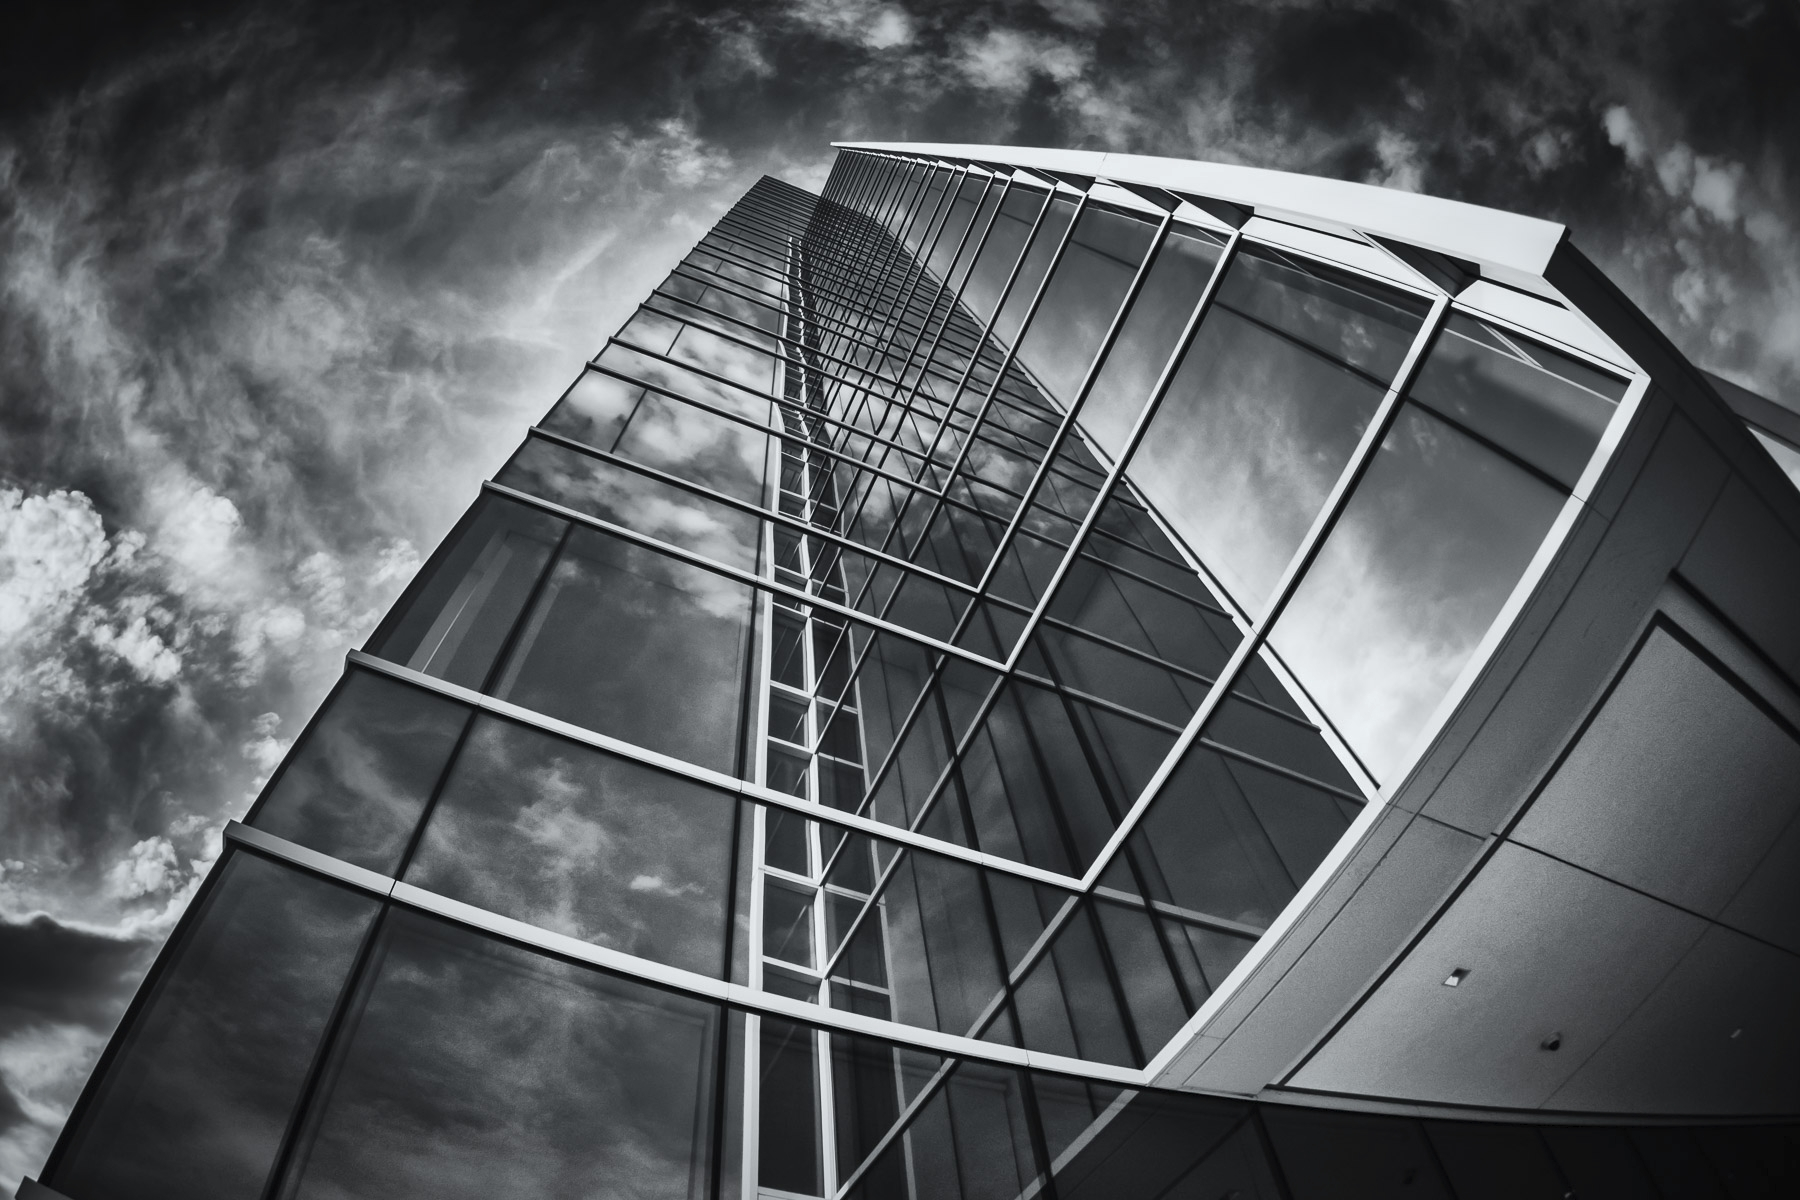 Mirror Sky HALL Arts building r - mattgharvey   ello